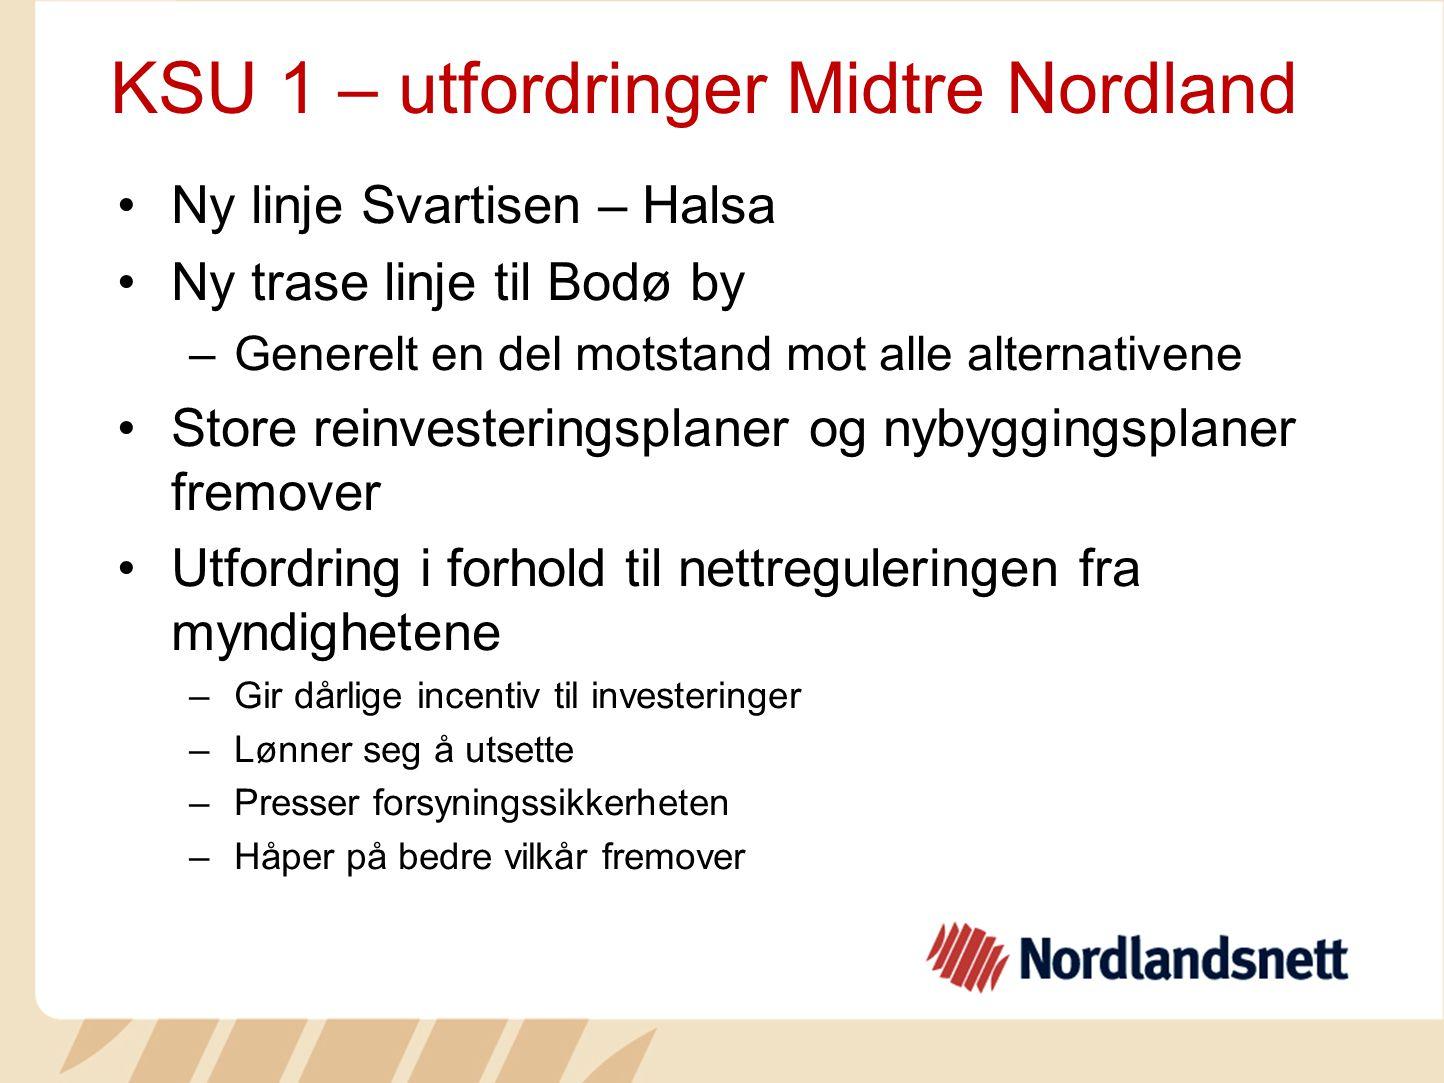 KSU 1 – utfordringer Midtre Nordland